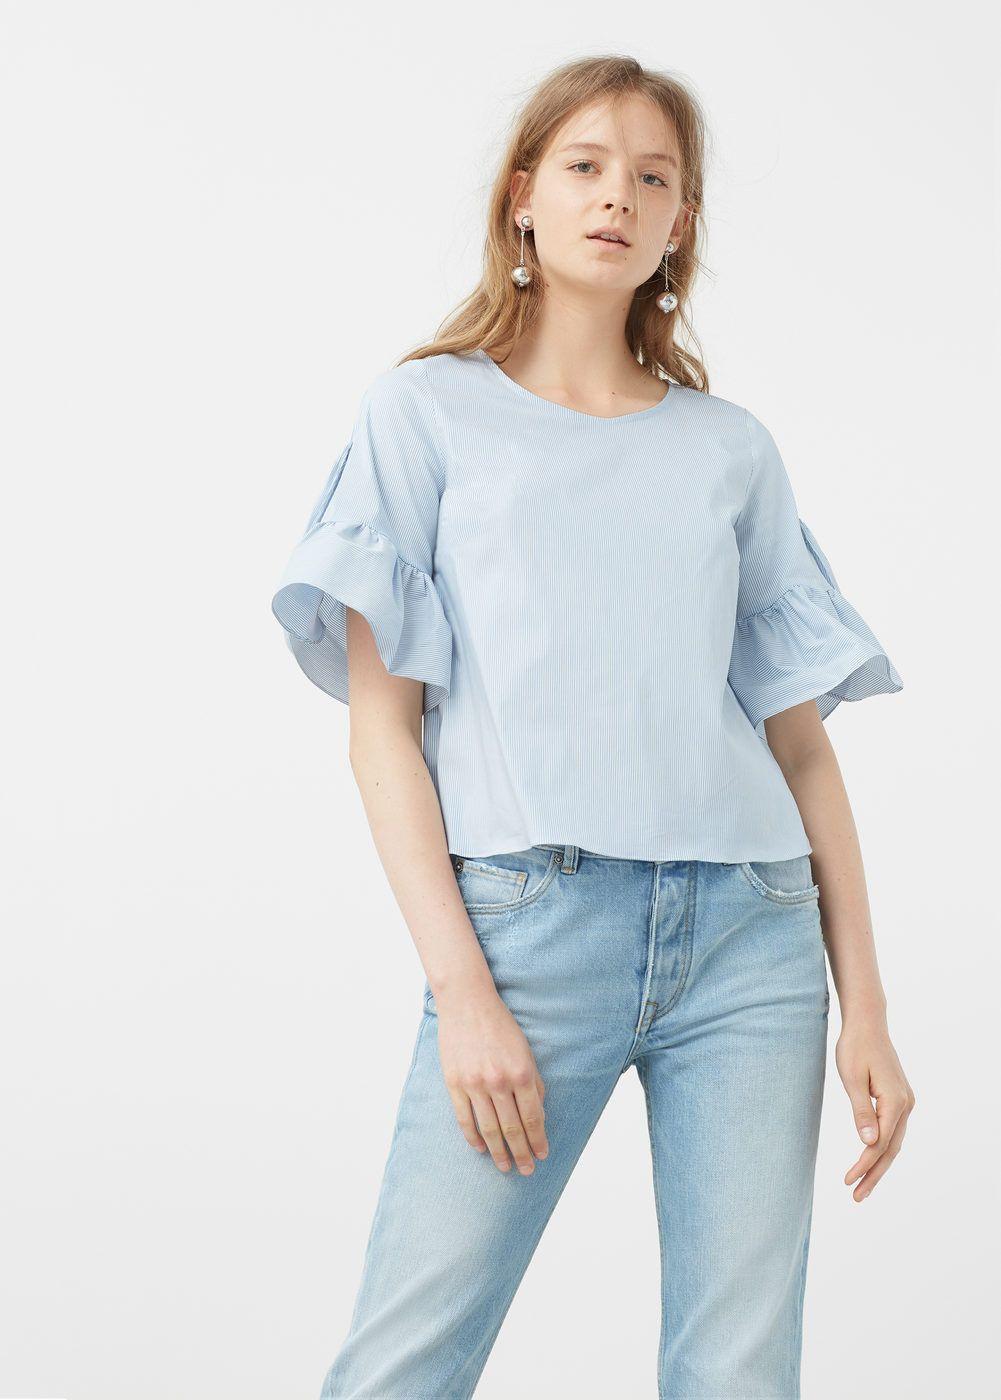 b10cdd00d Blusa de popeline - Camisas de Mulher